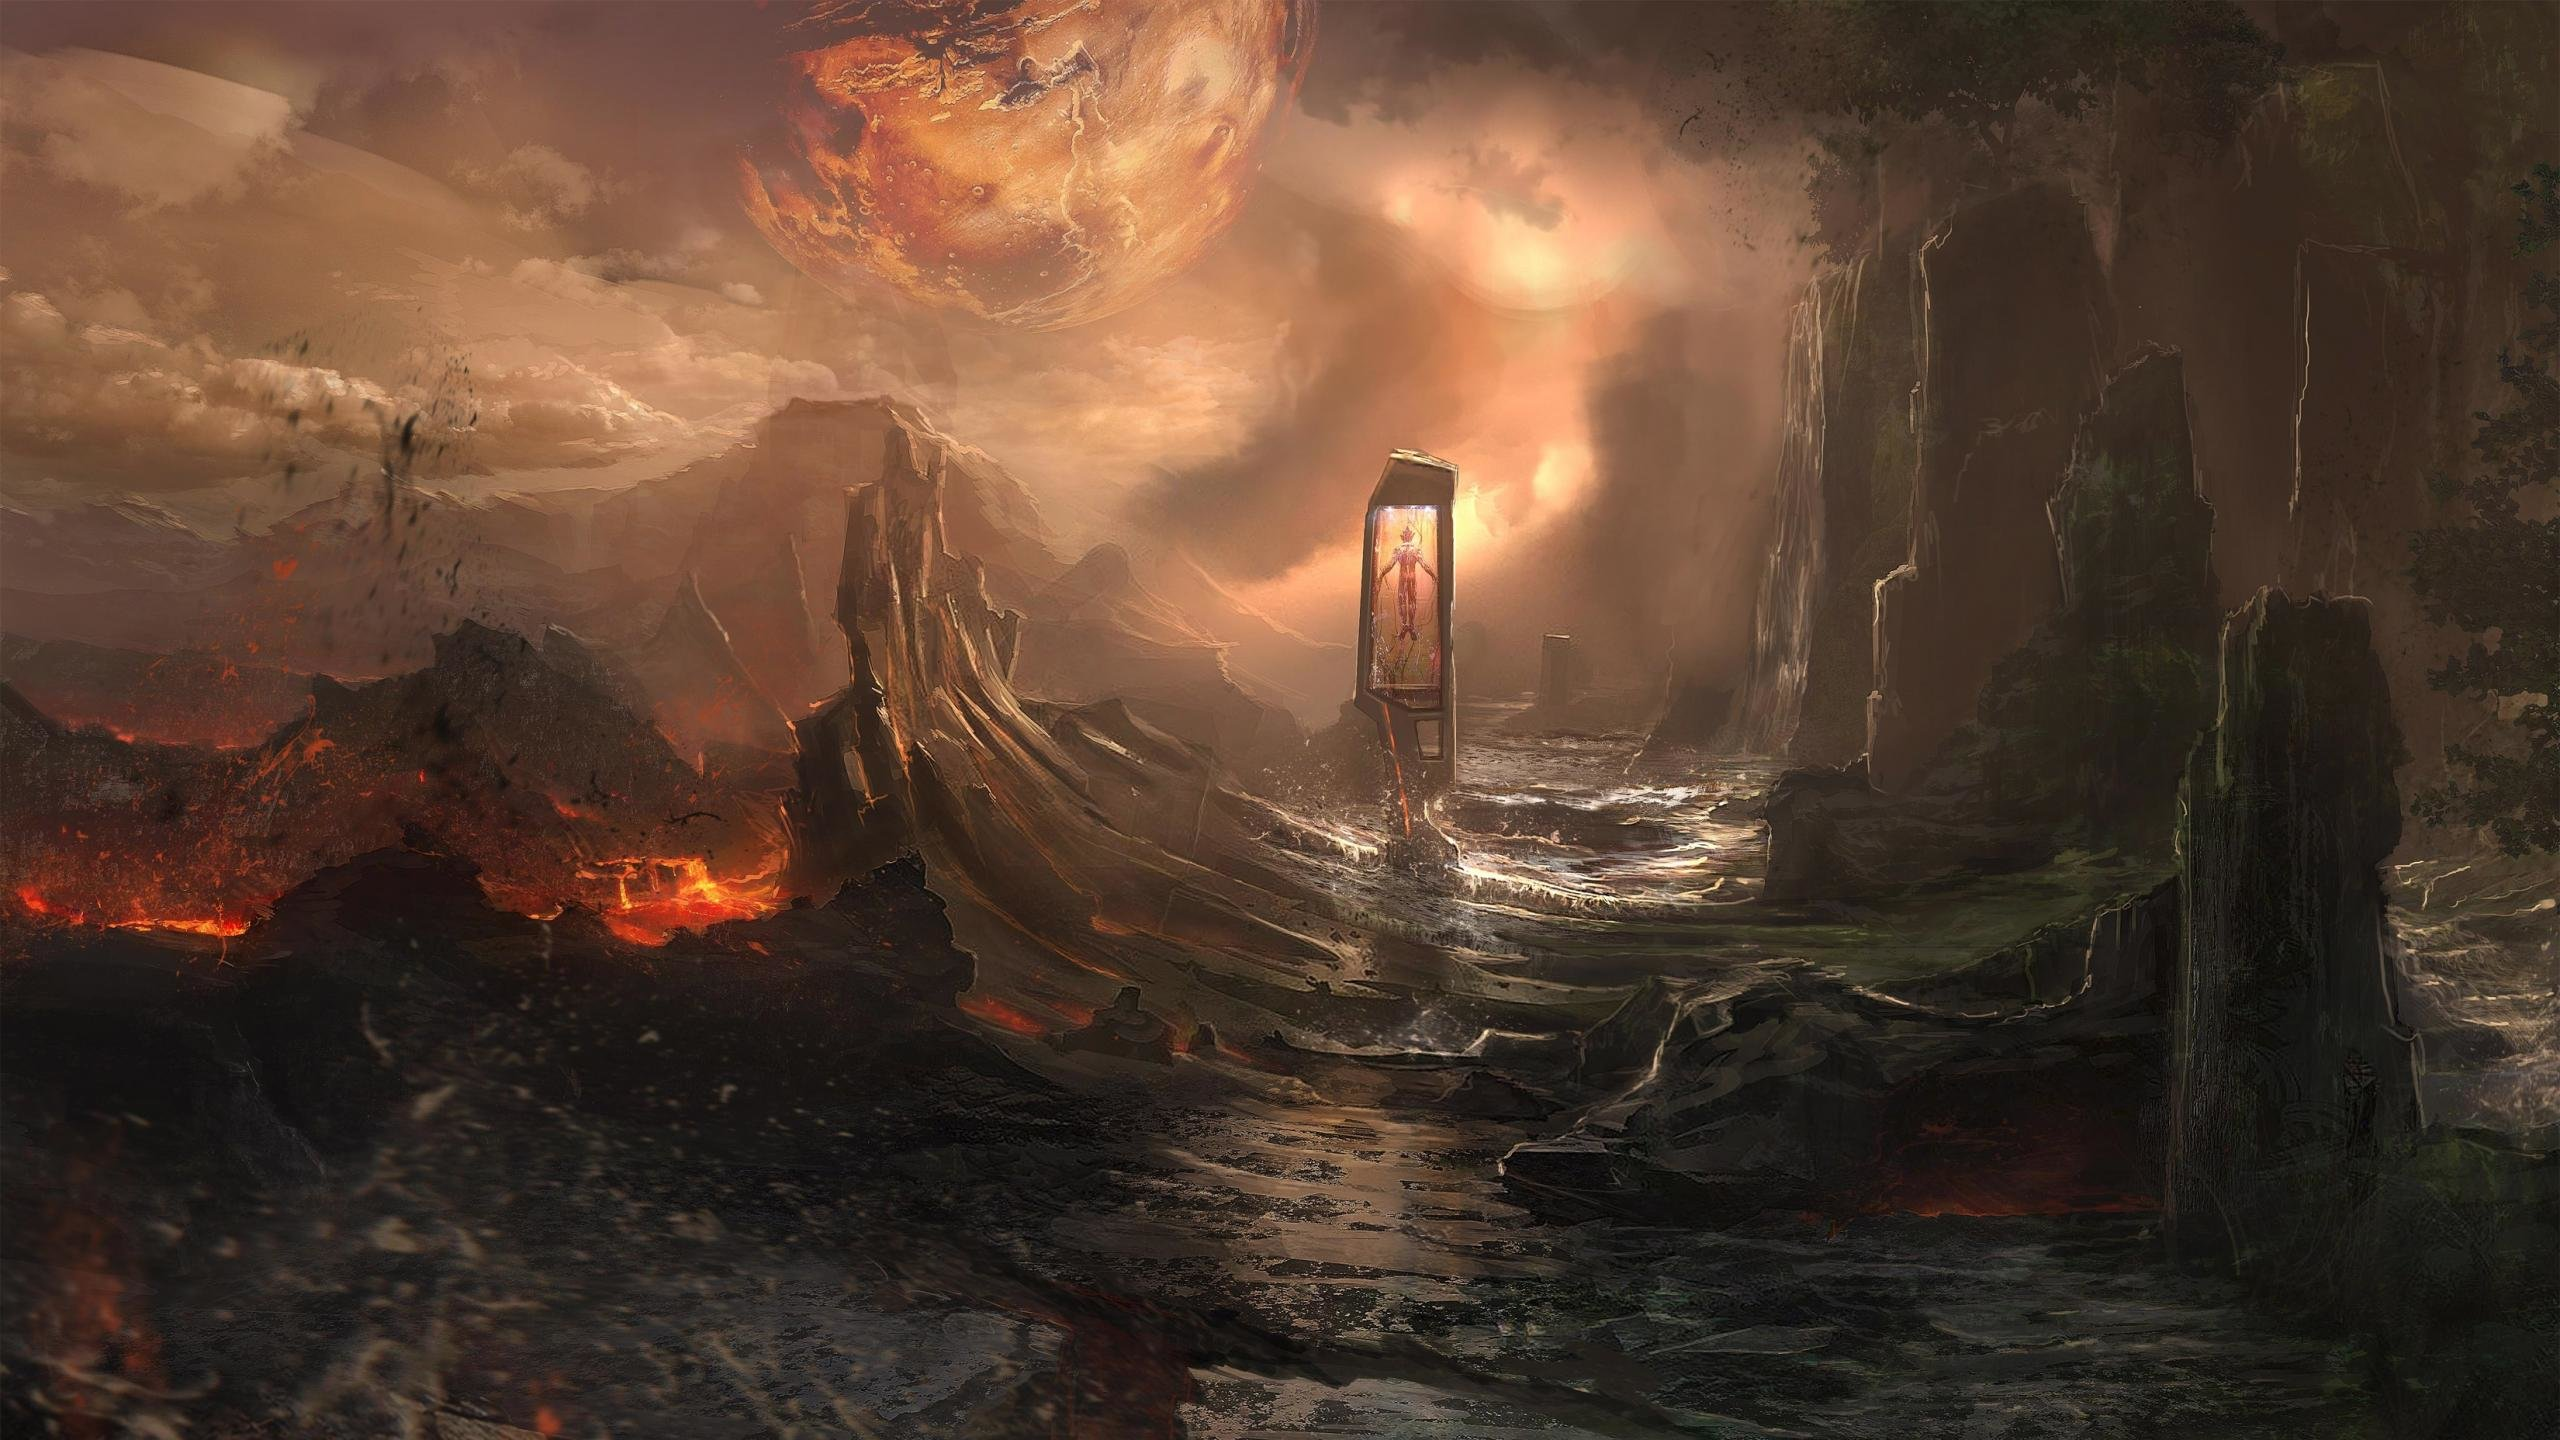 Fantasy Landscape Wallpapers 2560x1440 Desktop Backgrounds